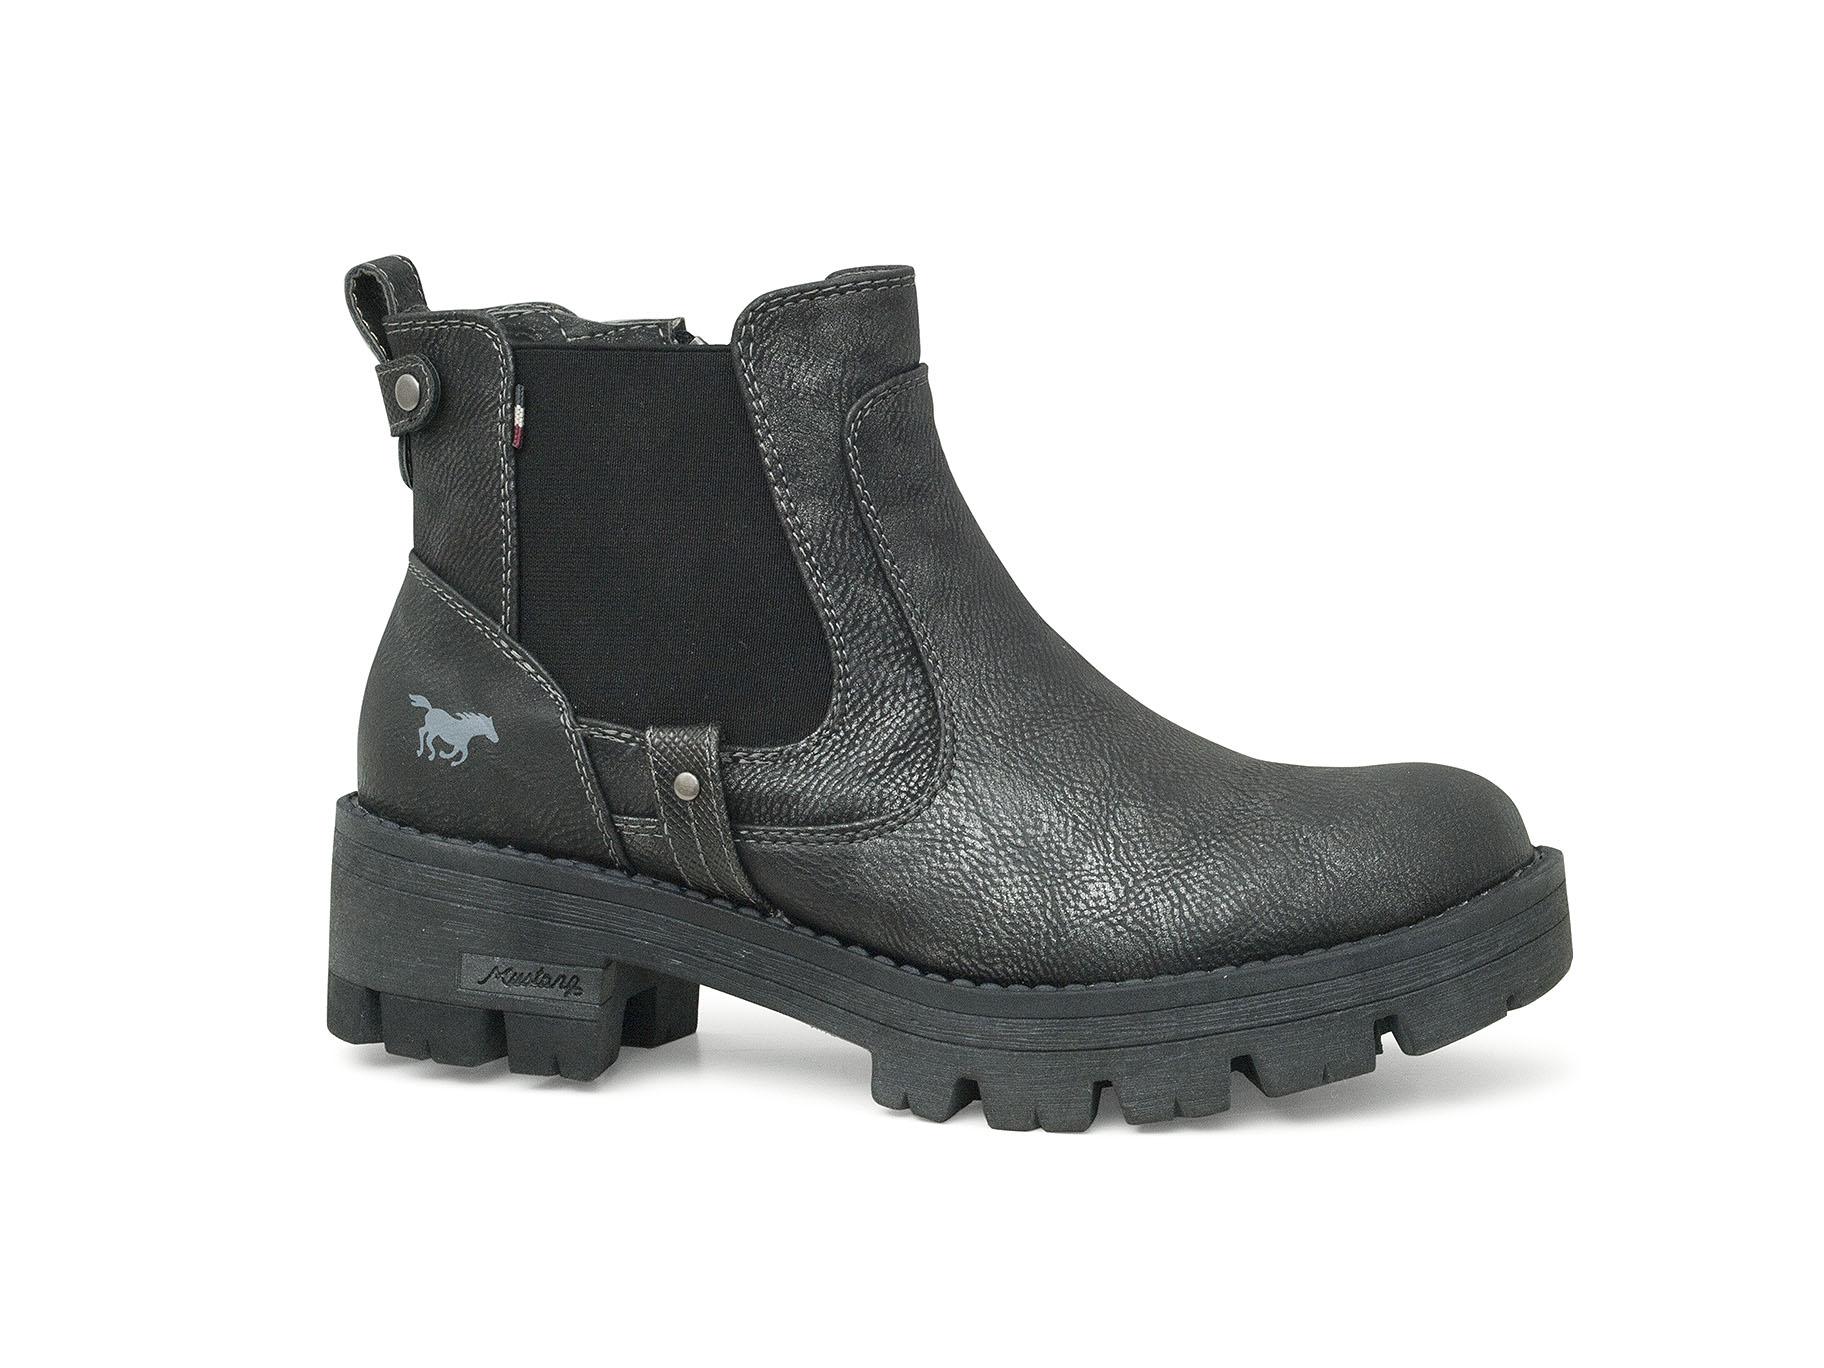 b807545d36966 Mustang botki, boots, stiefelette, polokozačky, polokozačky, čižmy nízke,  bottines, ...